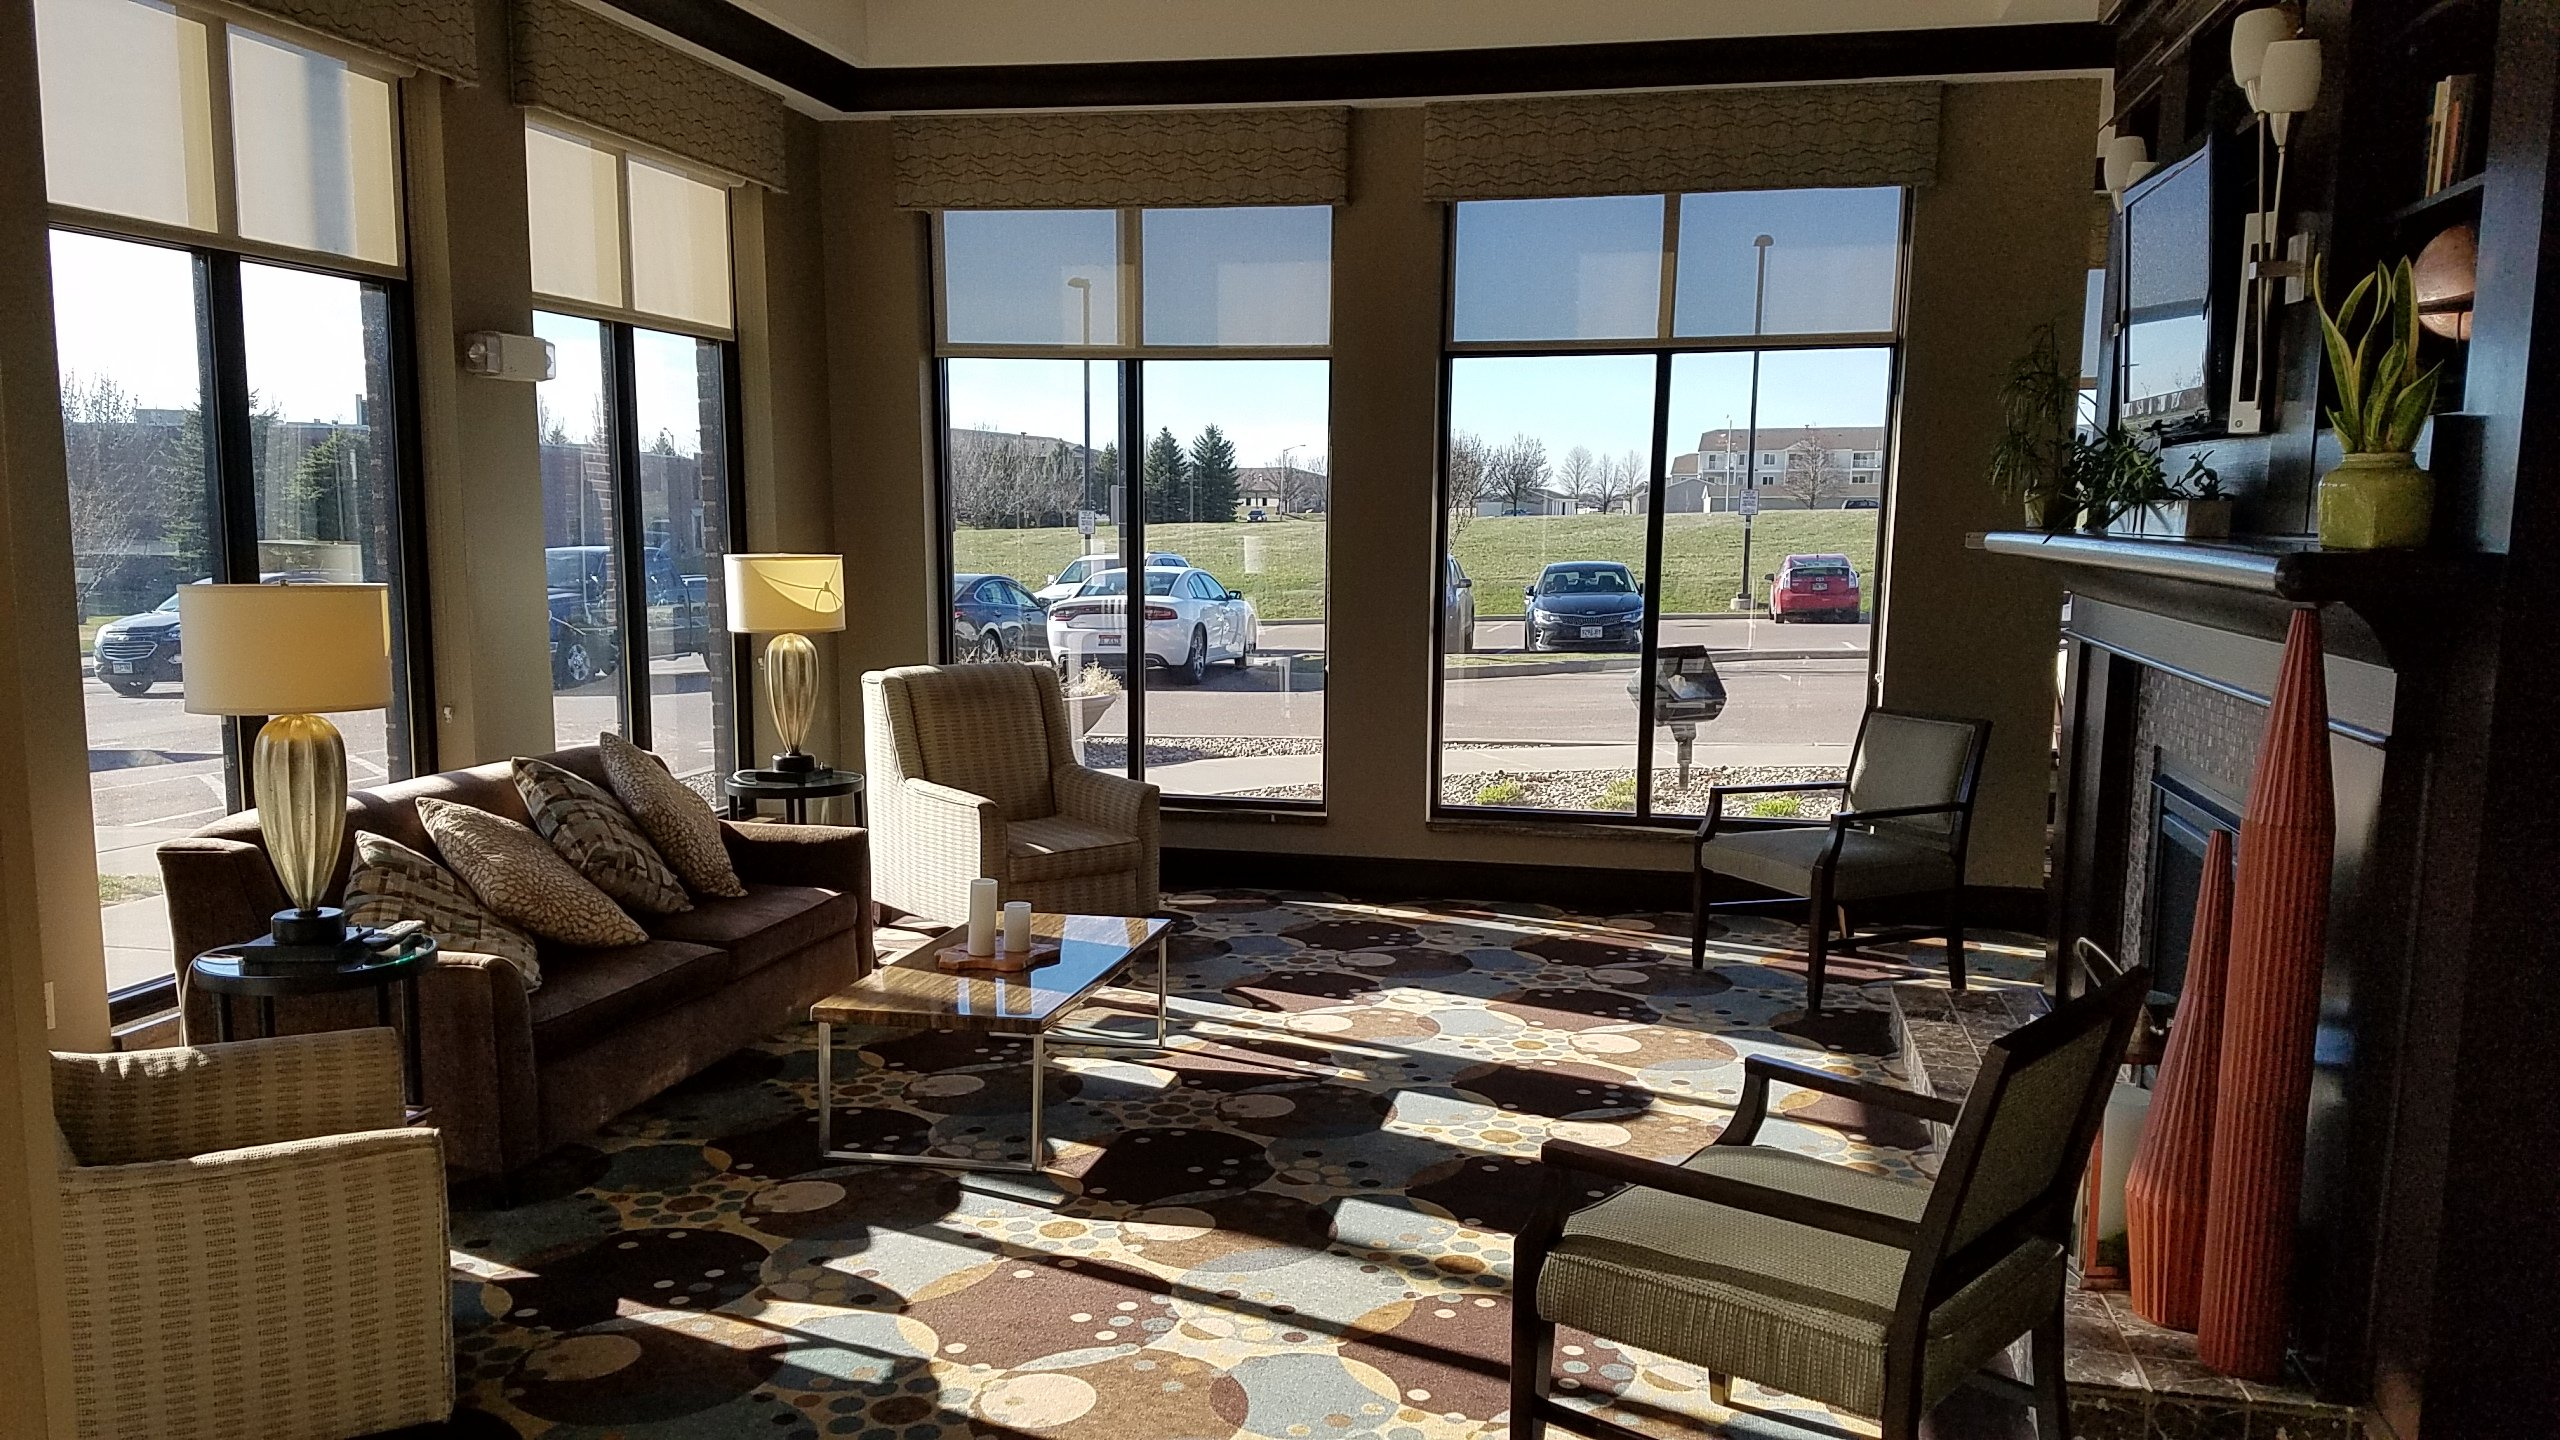 Hilton Garden Inn Sioux Falls South Sd 2017 Hotel Review